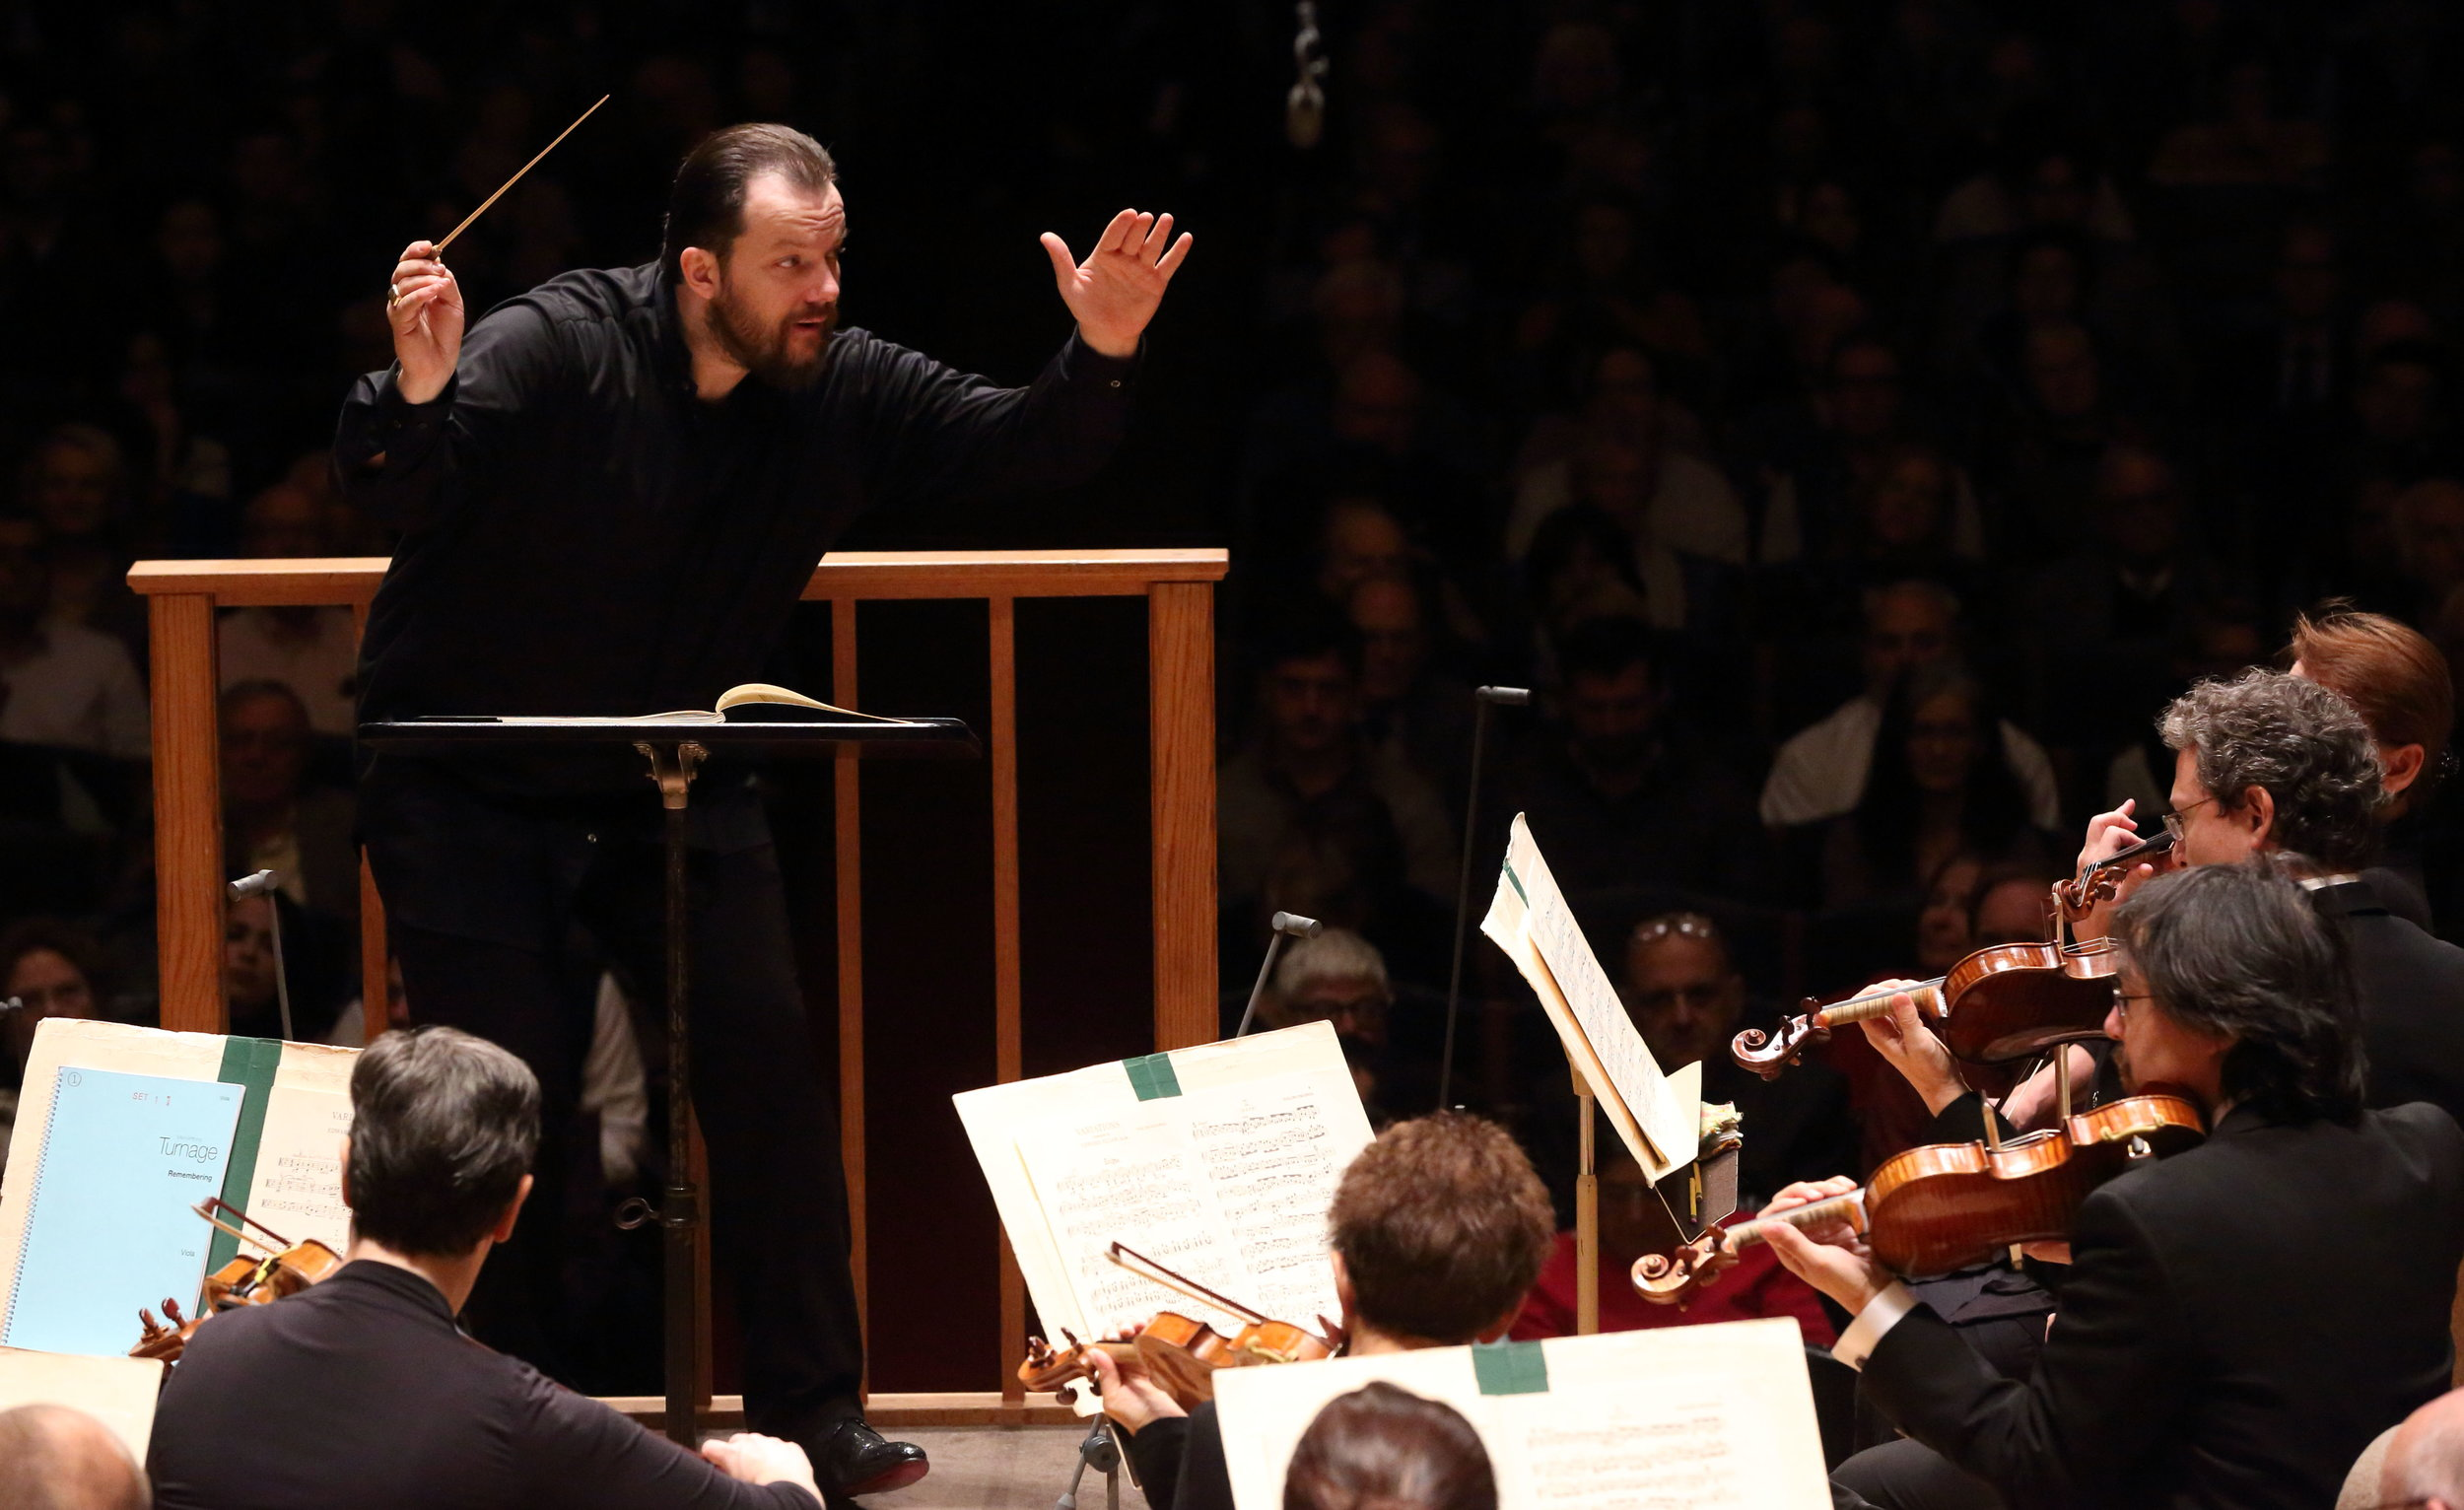 Andris Nelsons leads the Boston Symphony Orchestra, Thursday, Nov. 1, 2018, in Symphony Hall. Hilary Scott photograph